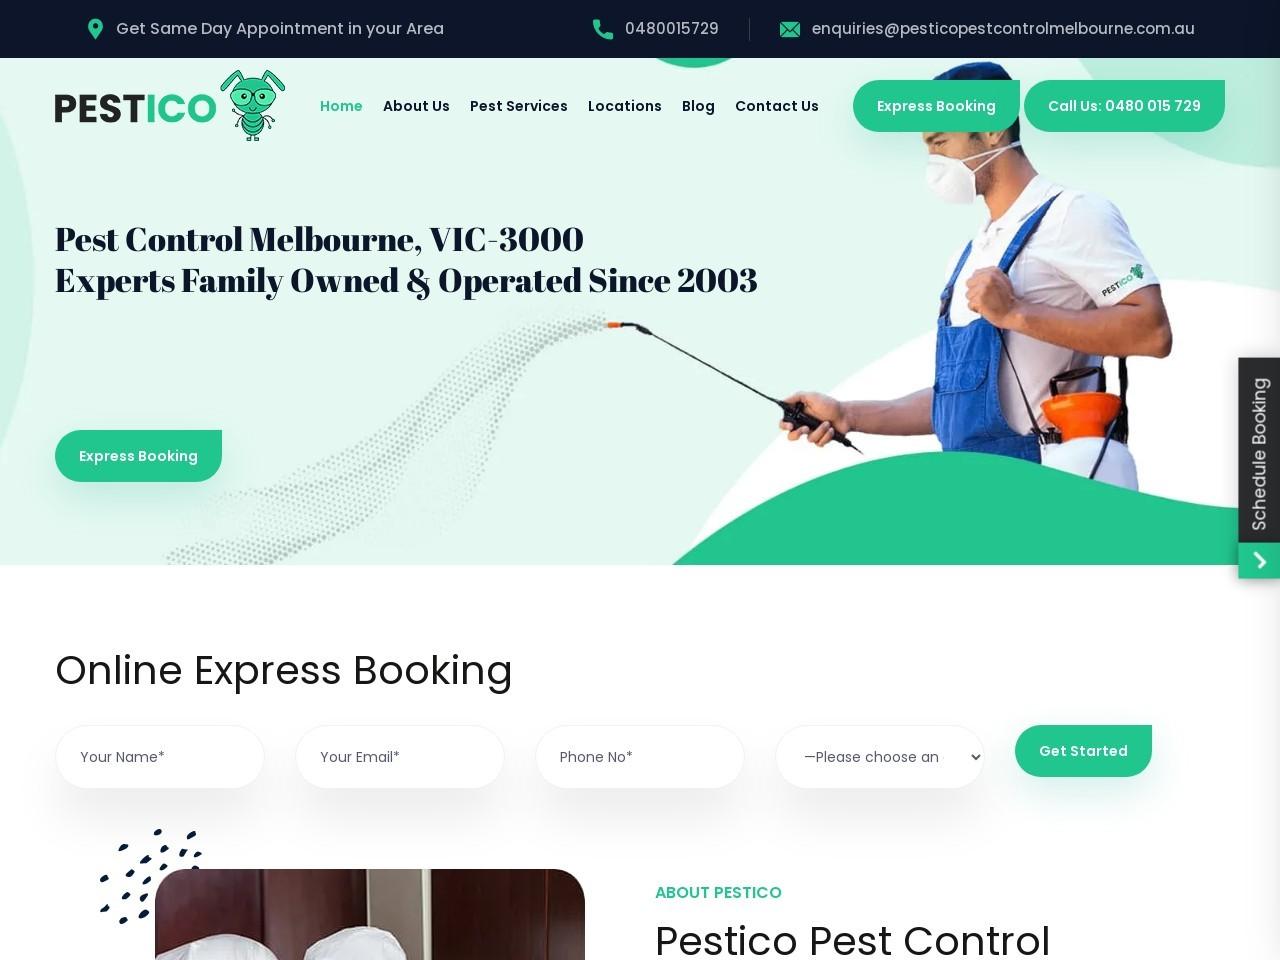 Termite Treatment, Termite Control Melbourne | +61480015729 |Pestico Pest Control Melbourne